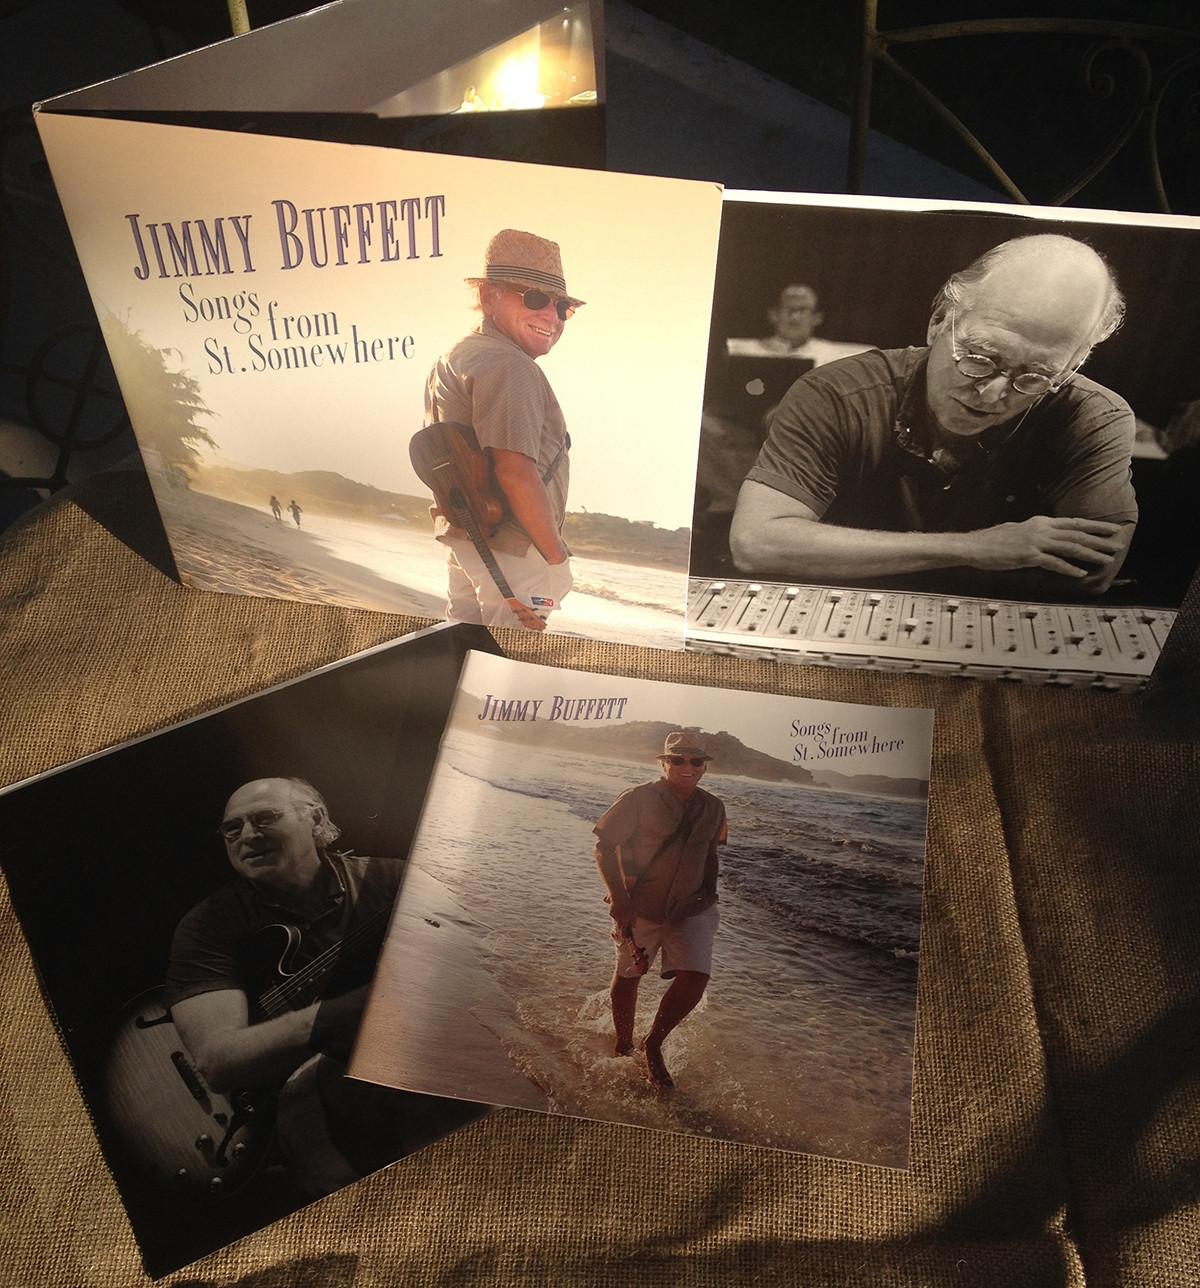 Jimmy Buffett Songs From St.Somewhere vinyl